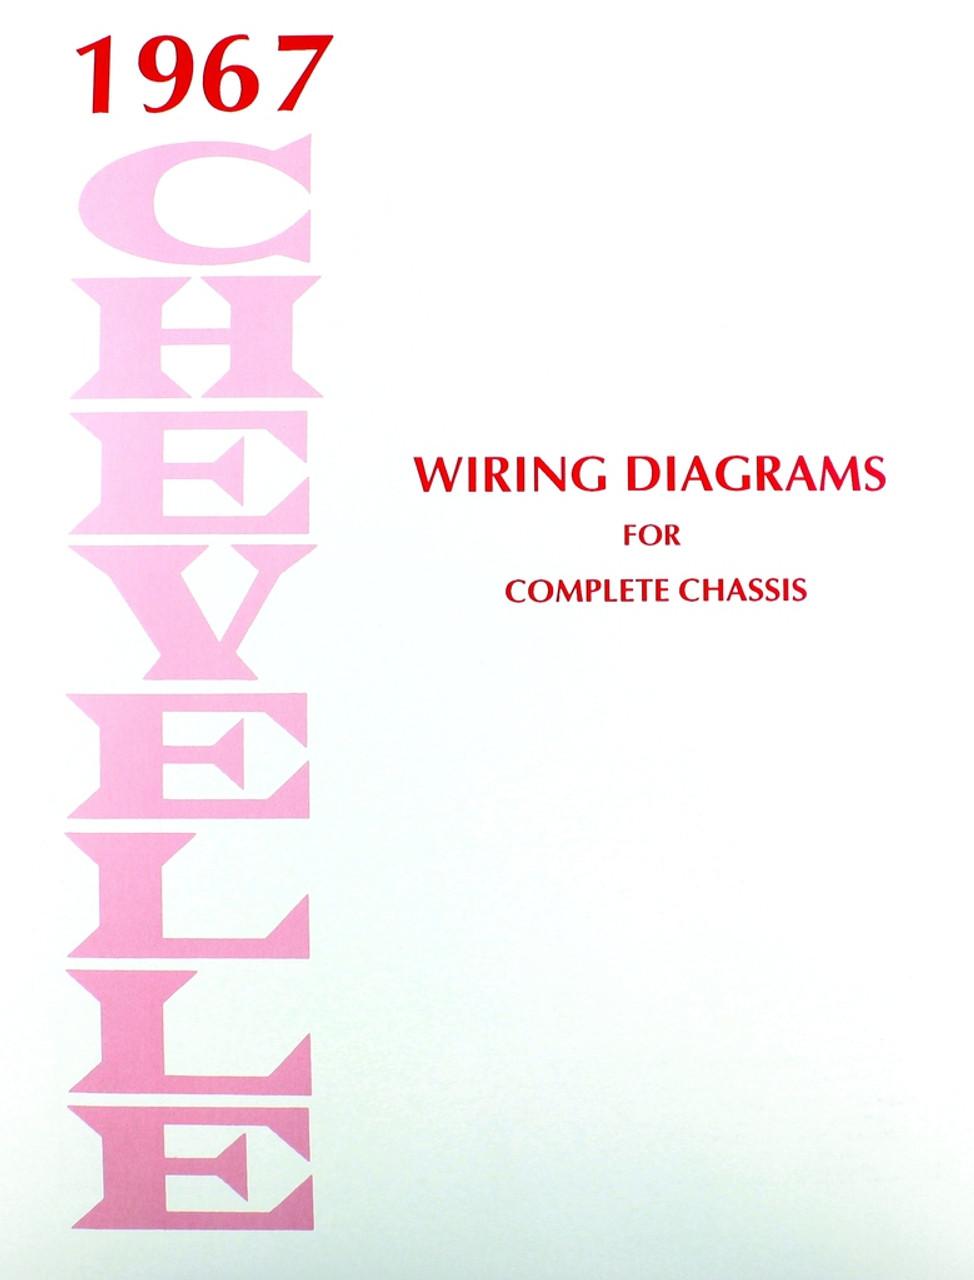 DIAGRAM] 69 1969 Chevelle El Camino Electrical Wiring Diagram Manual FULL  Version HD Quality Diagram Manual - SCHEMATICSPED.GRANVILLE-NATATION.FRschematicsped.granville-natation.fr